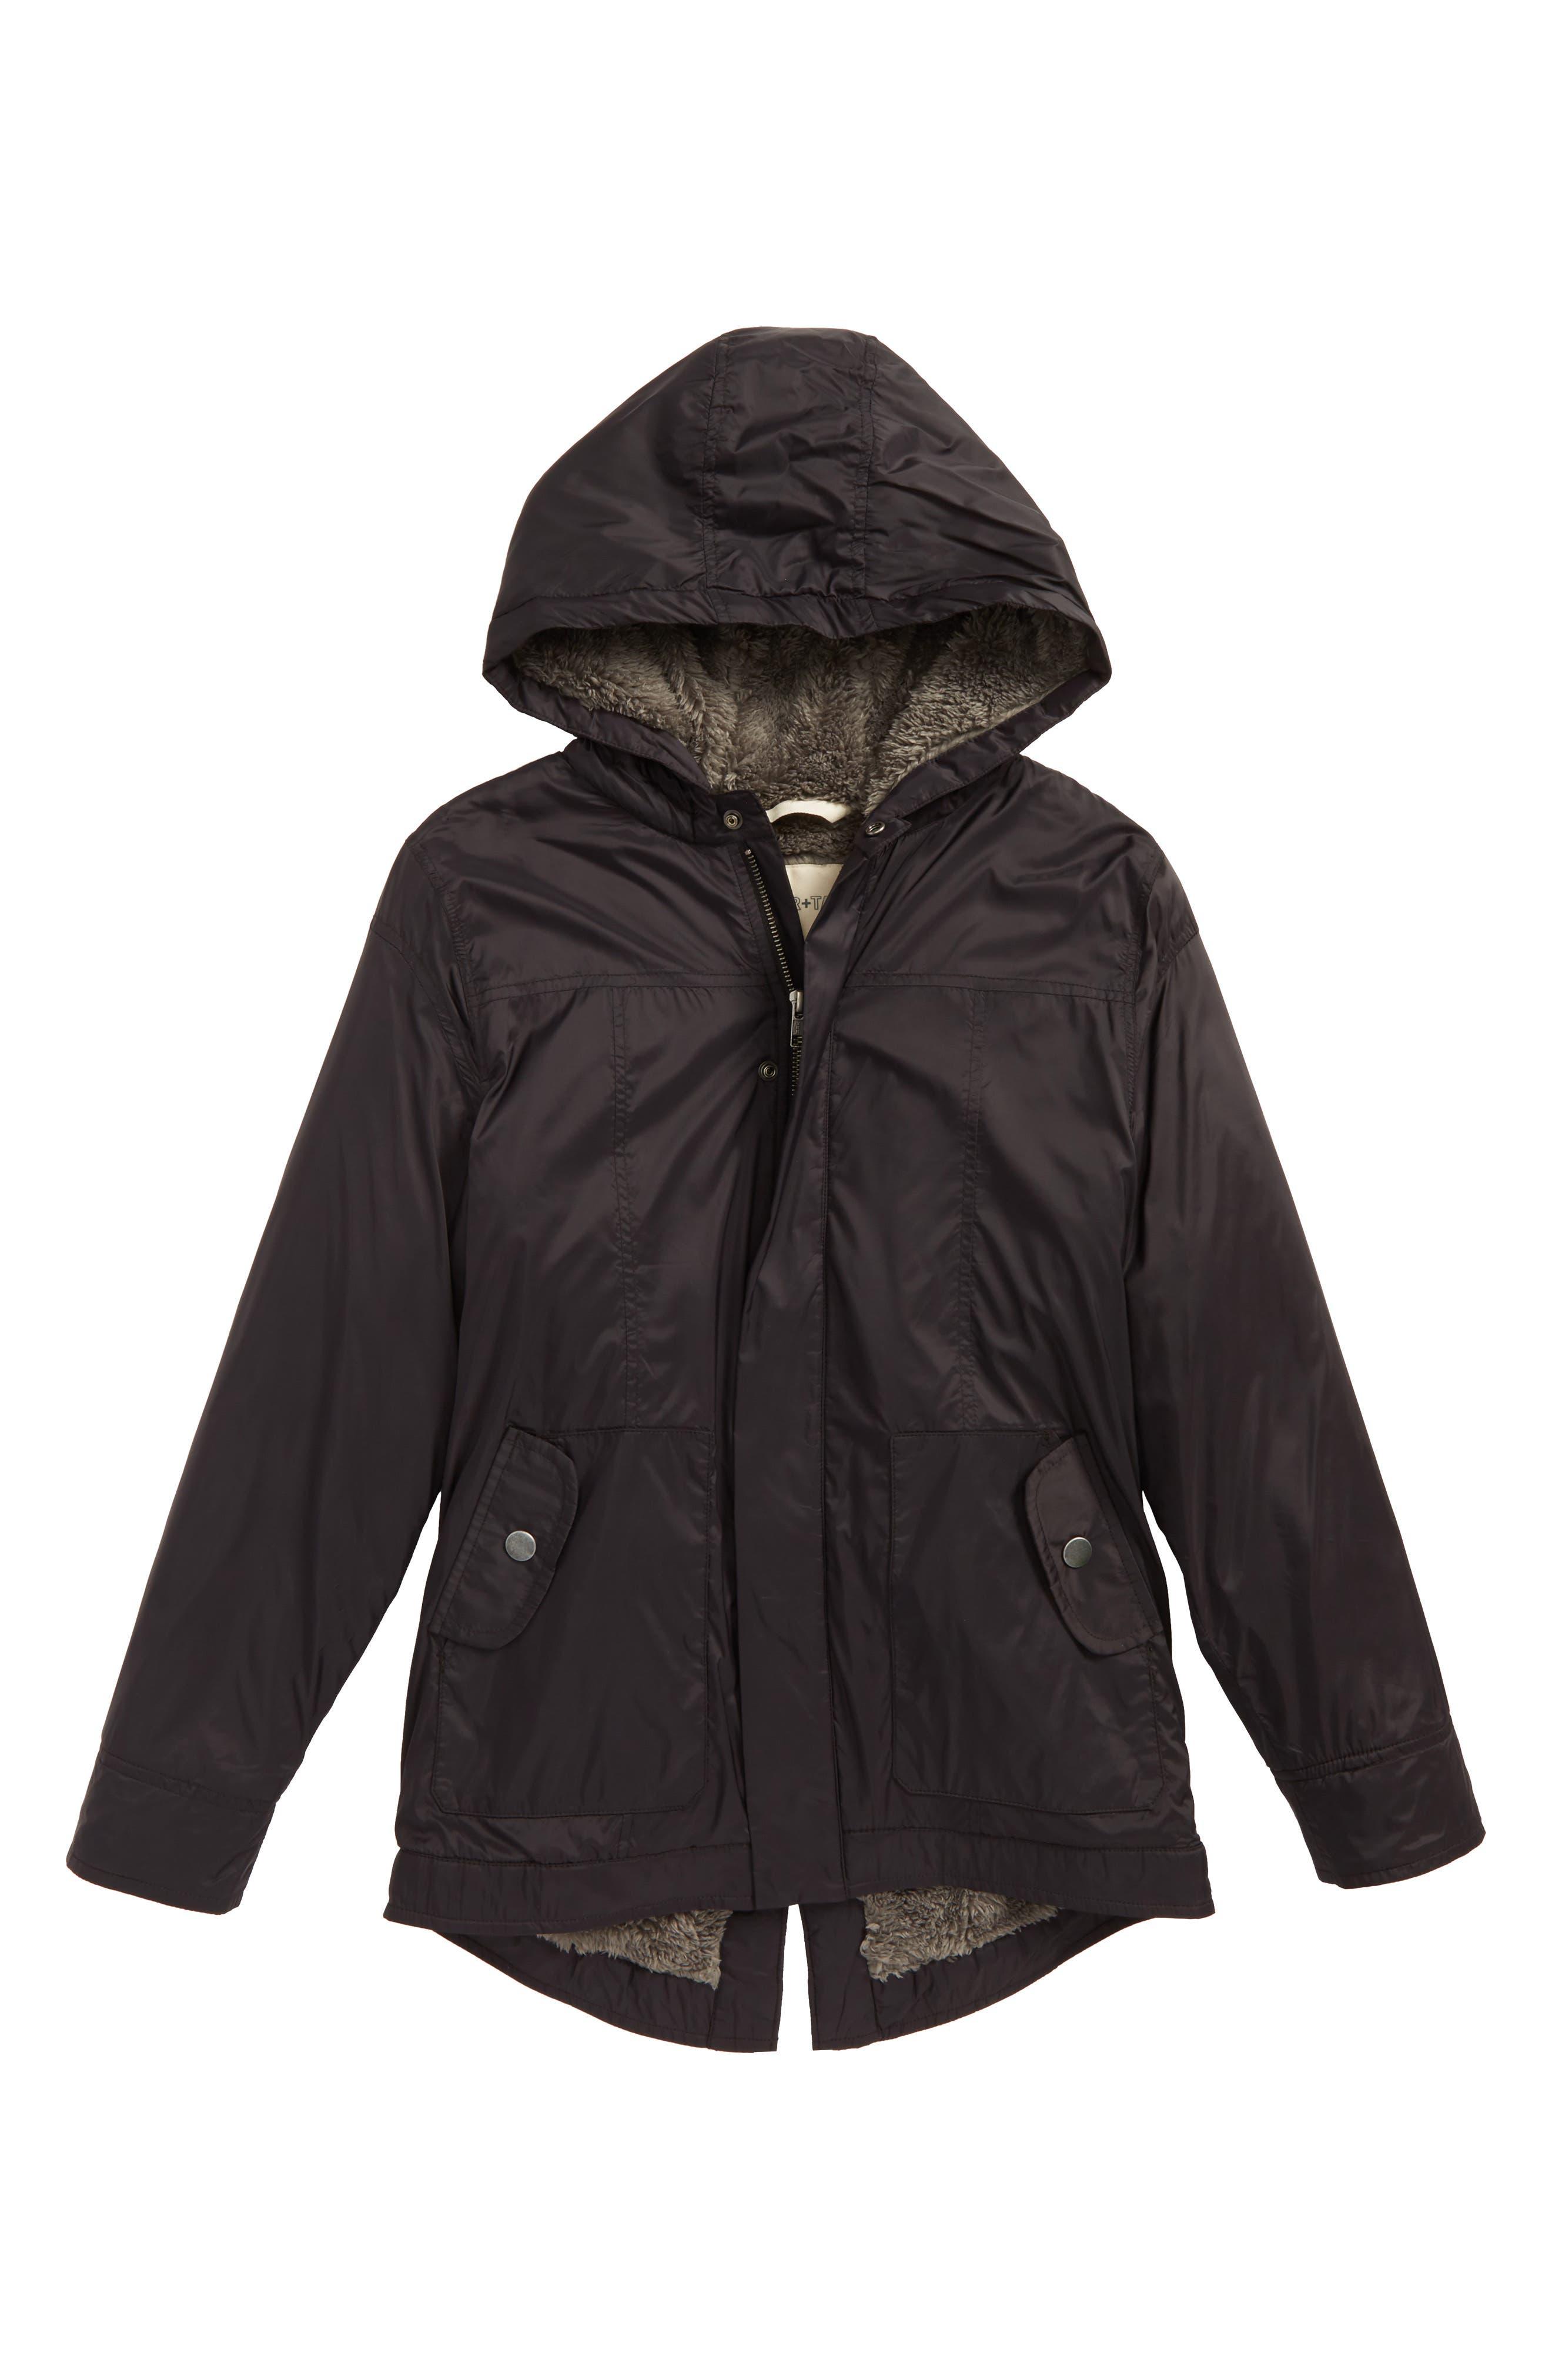 Alternate Image 1 Selected - Tucker + Tate Water Resistant Nylon Hooded Jacket (Big Boys)